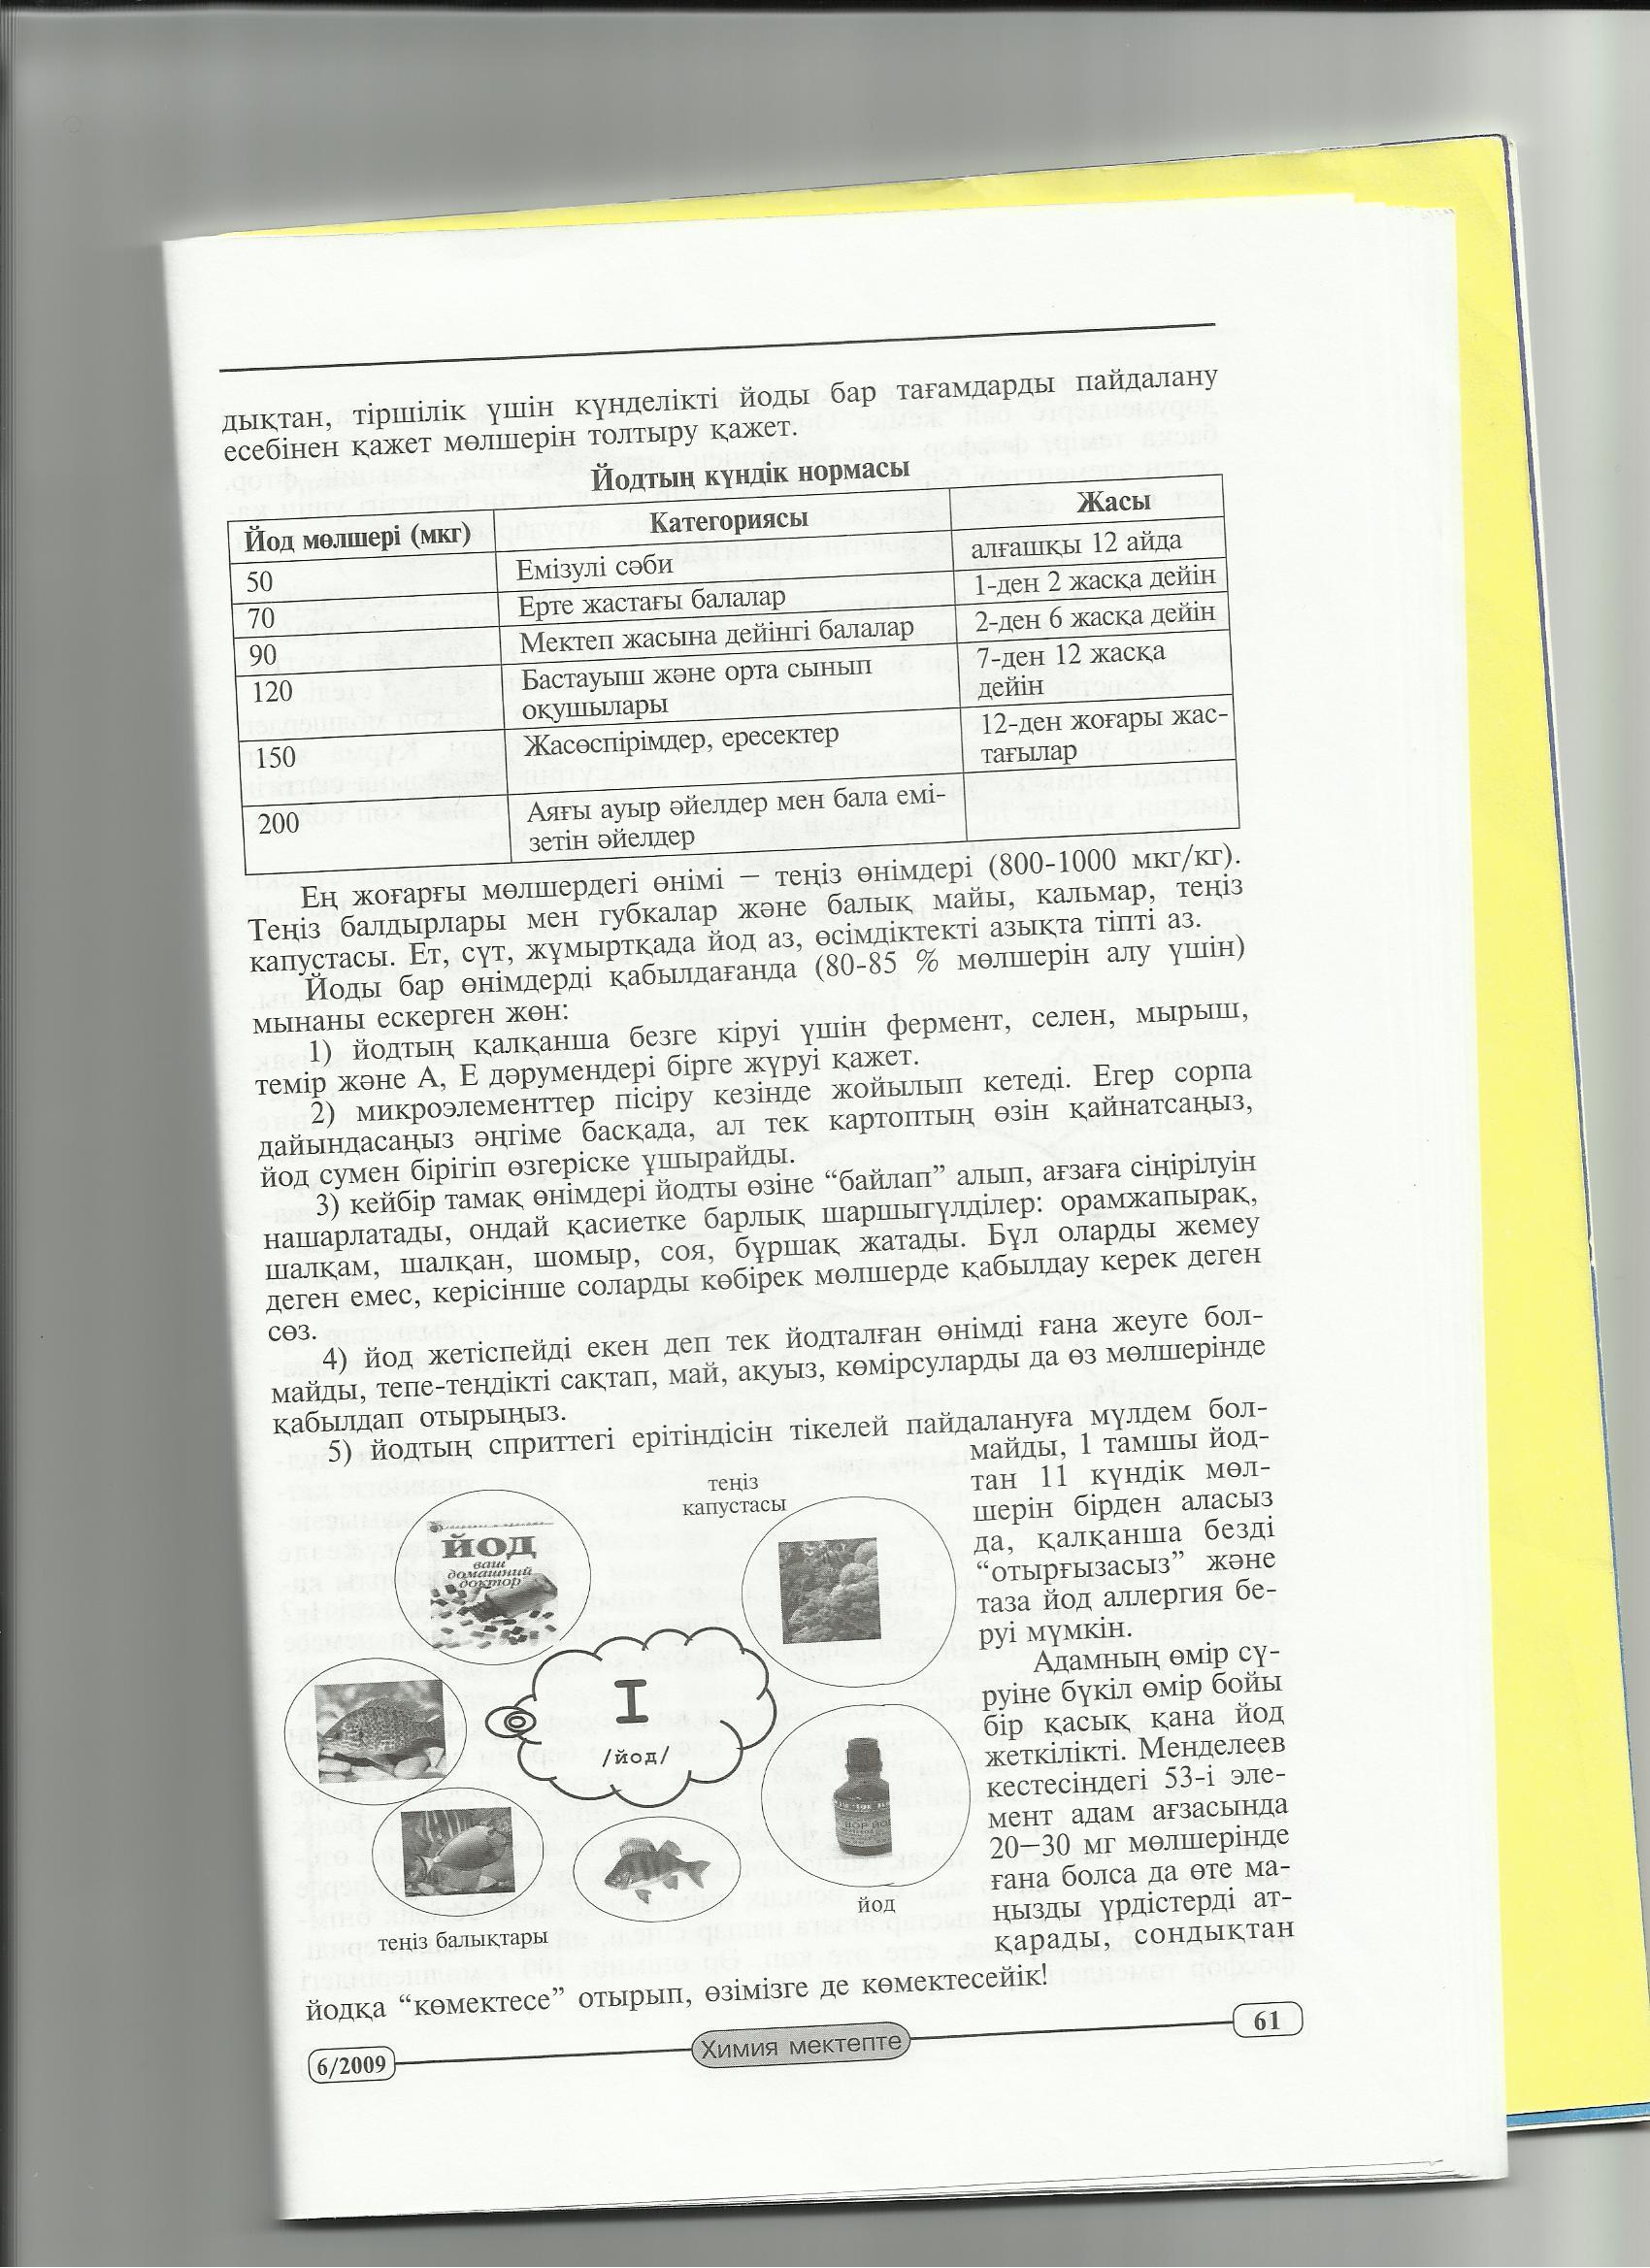 C:\Documents and Settings\Администратор\Рабочий стол\Новая папка (3)\12.jpg